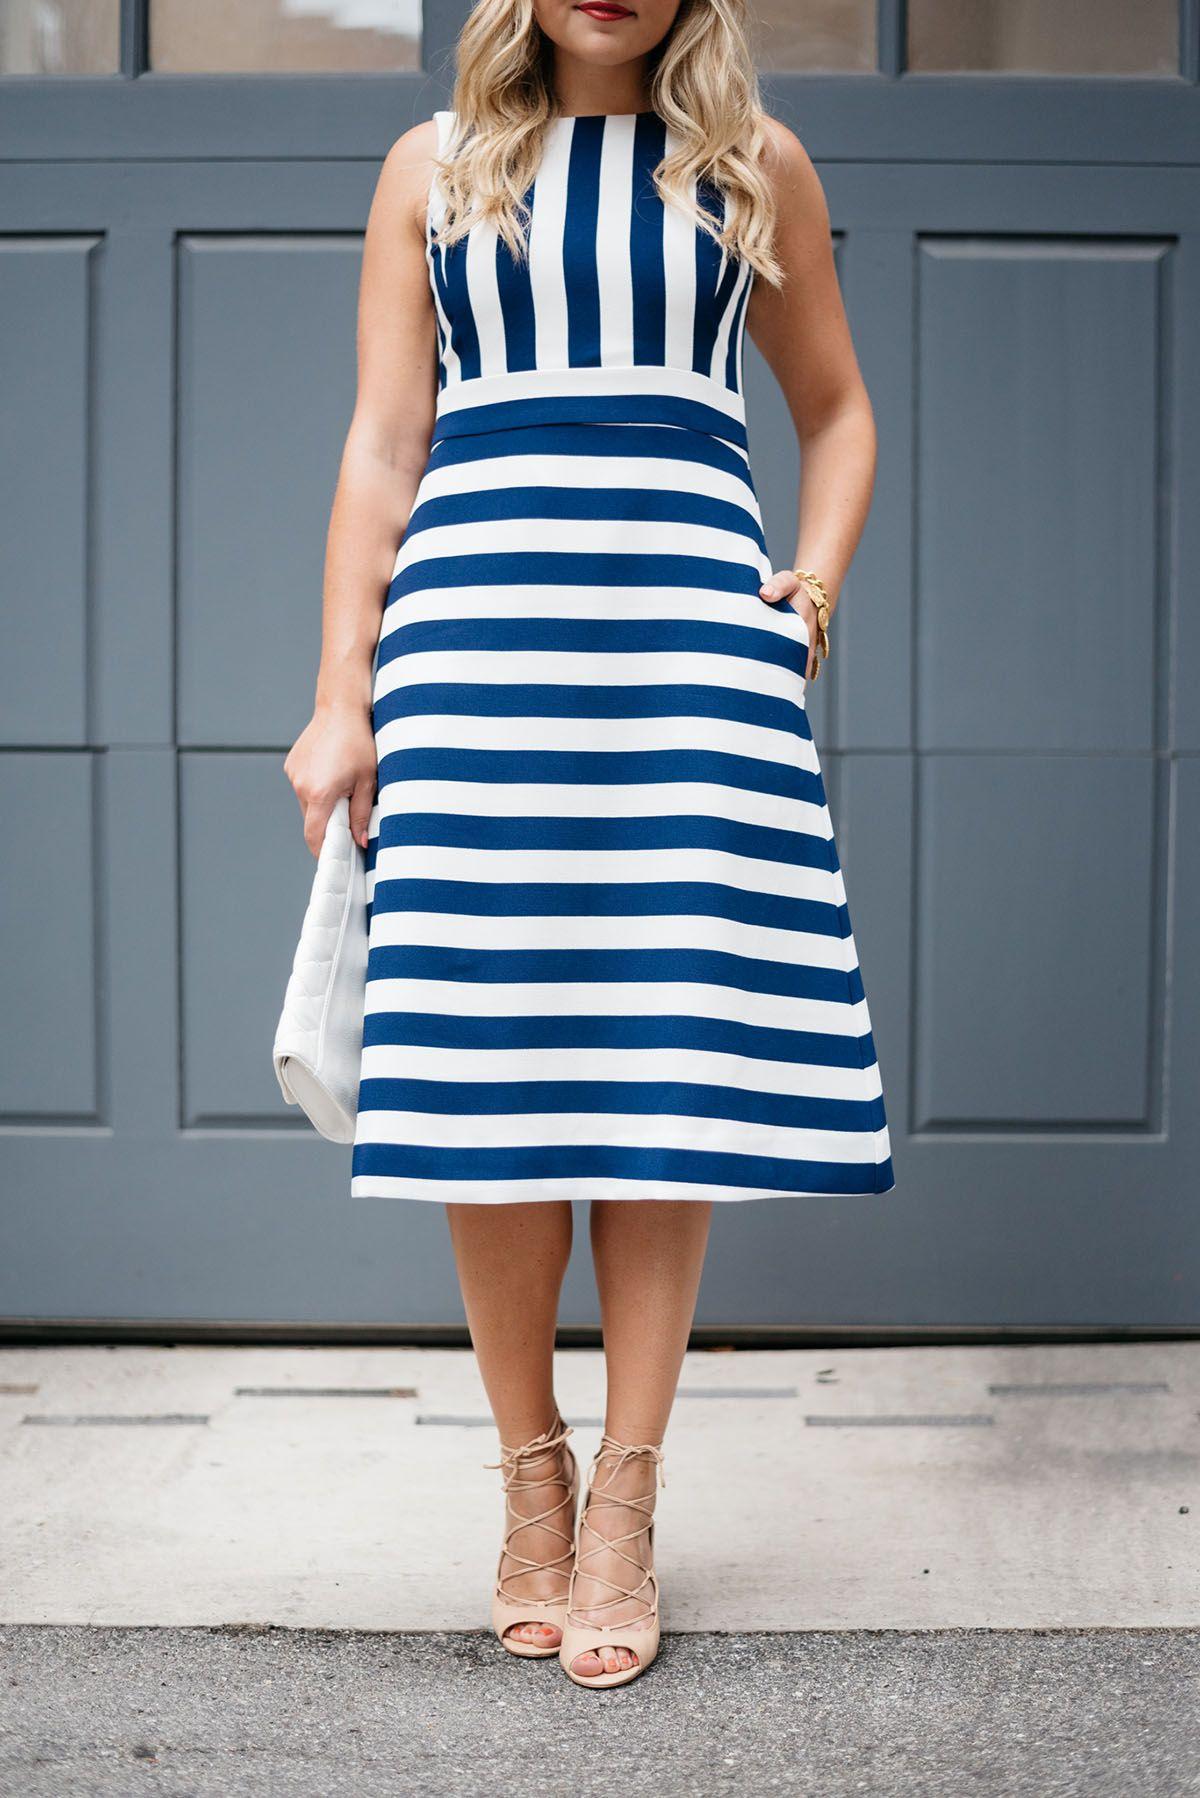 Spring Summer Staple The Nautical Striped Dress Bows Sequins Striped Dress Spring Spring Summer Dress Striped Dress [ 1798 x 1200 Pixel ]